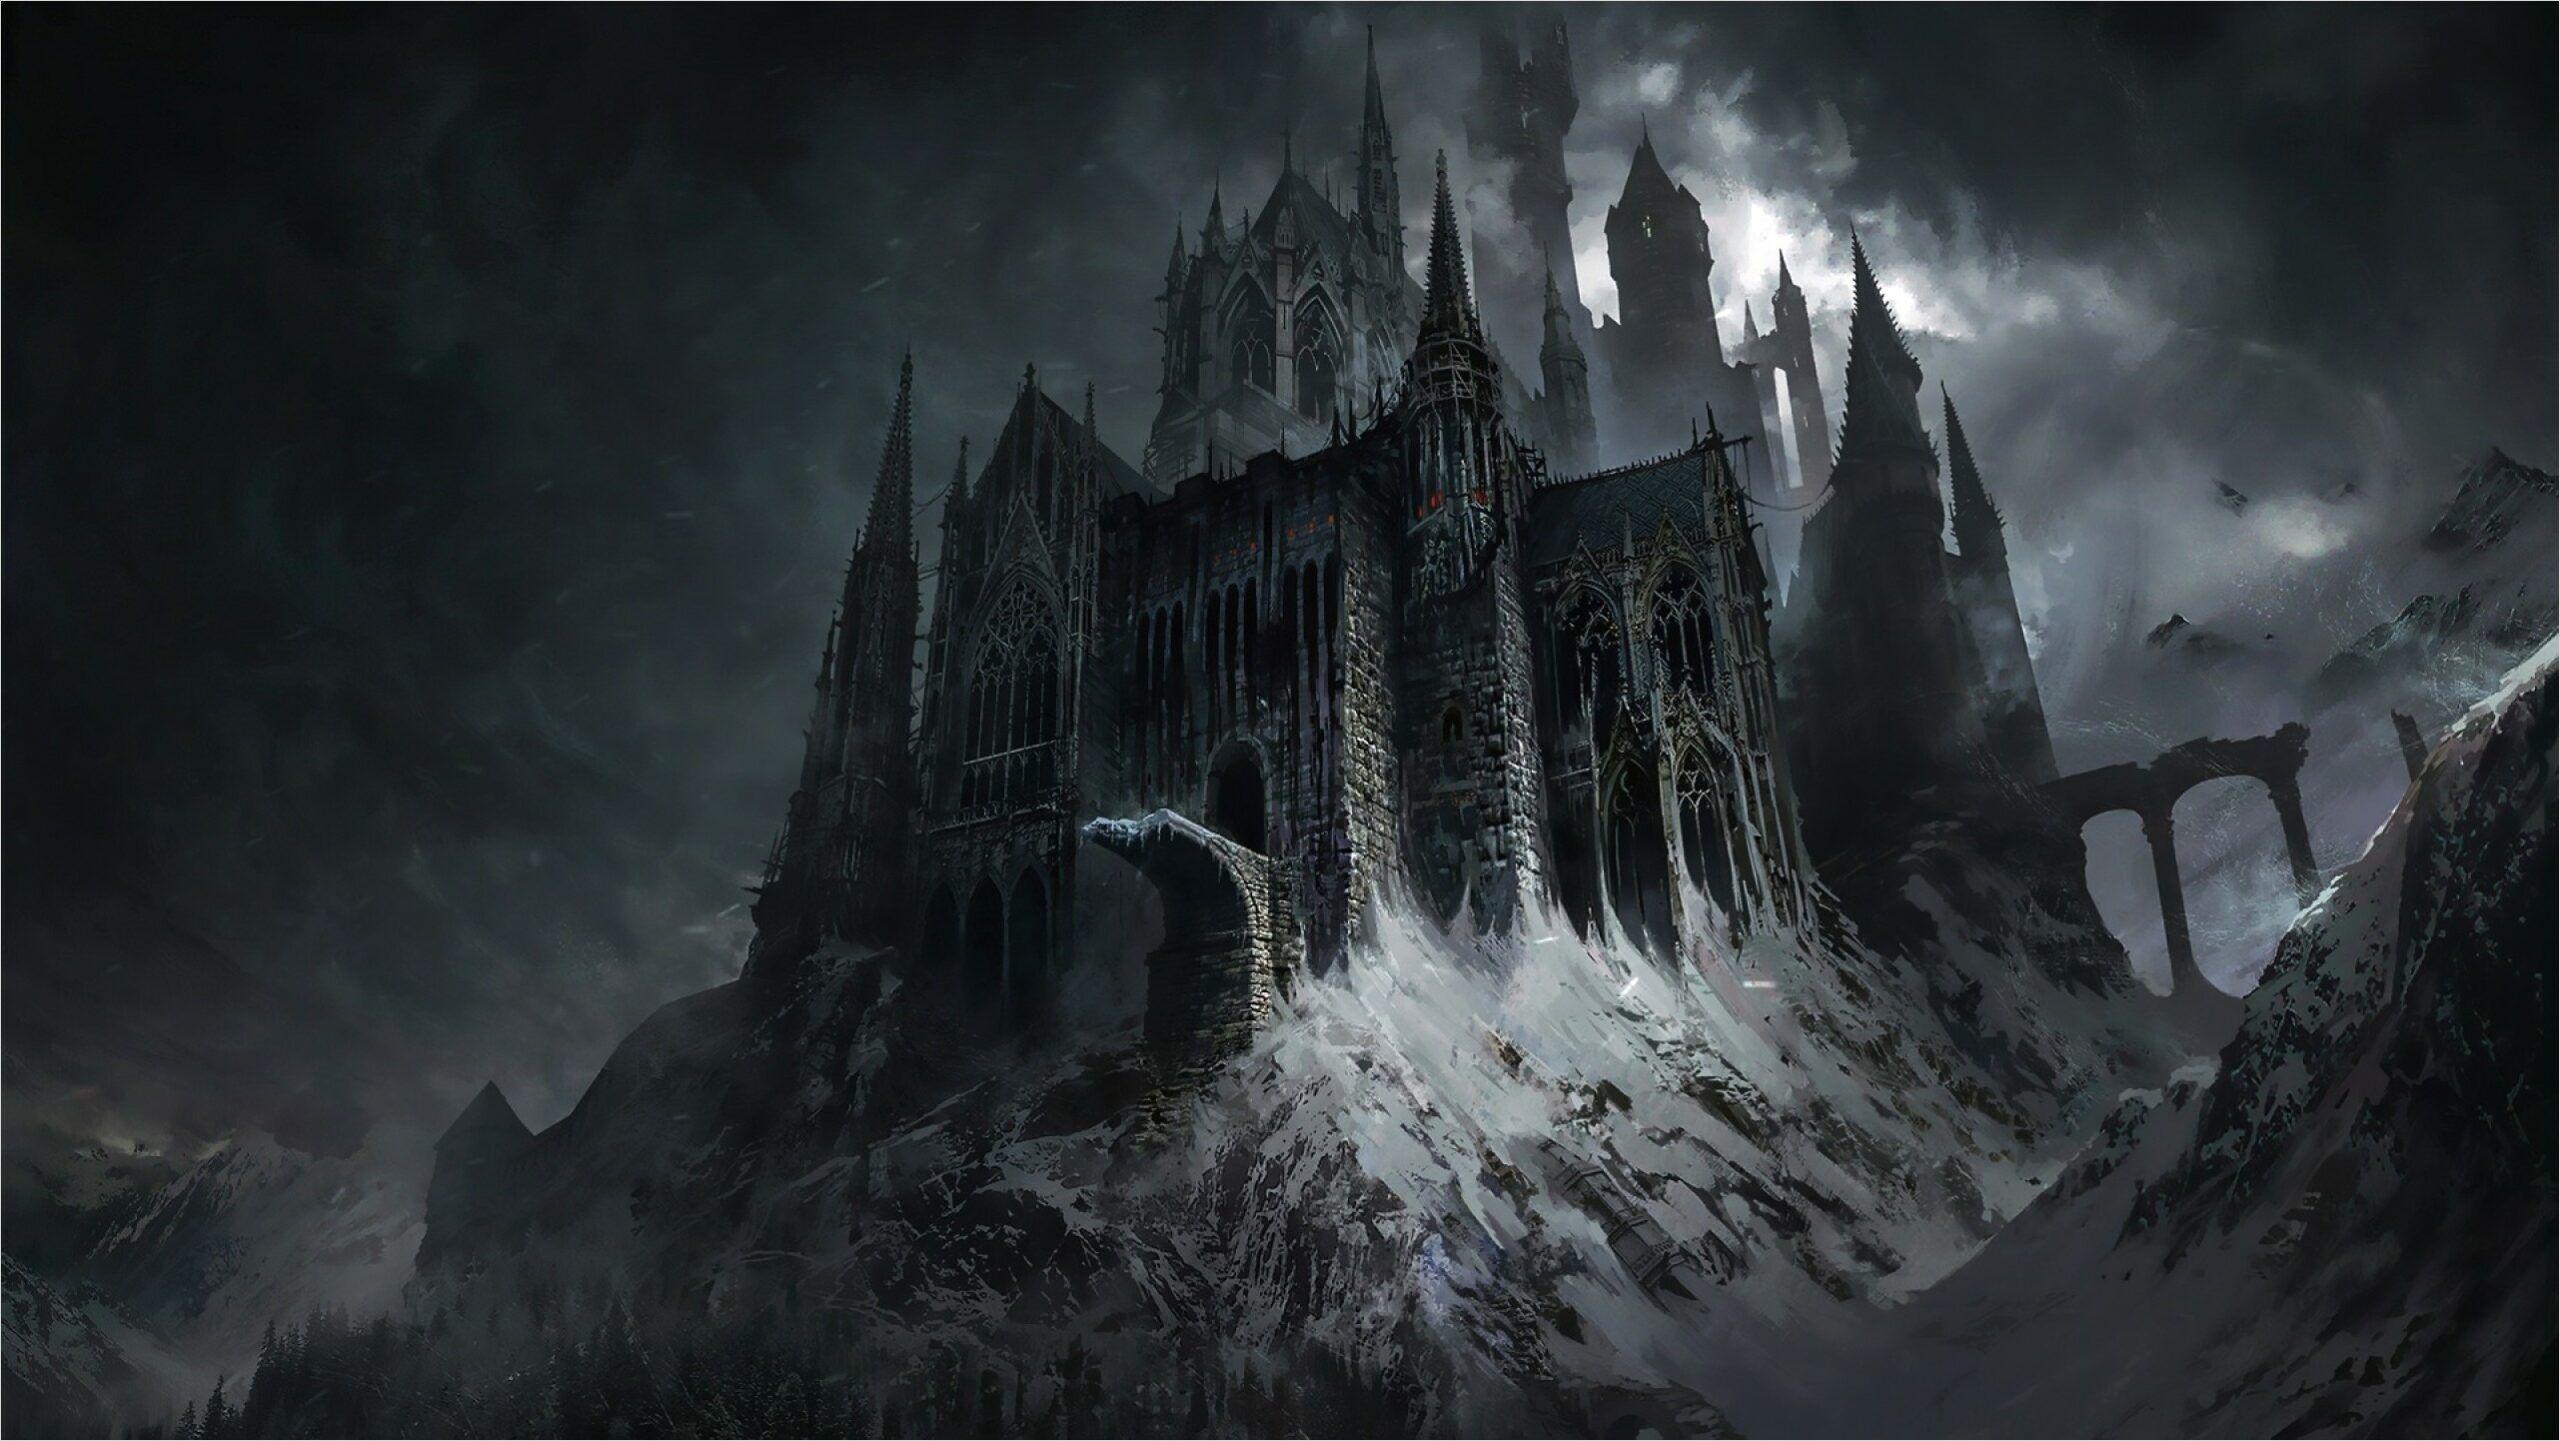 4k Fantasy Castle Wallpapers In 2020 Fantasy Castle Dark Fantasy Dark Fantasy Art